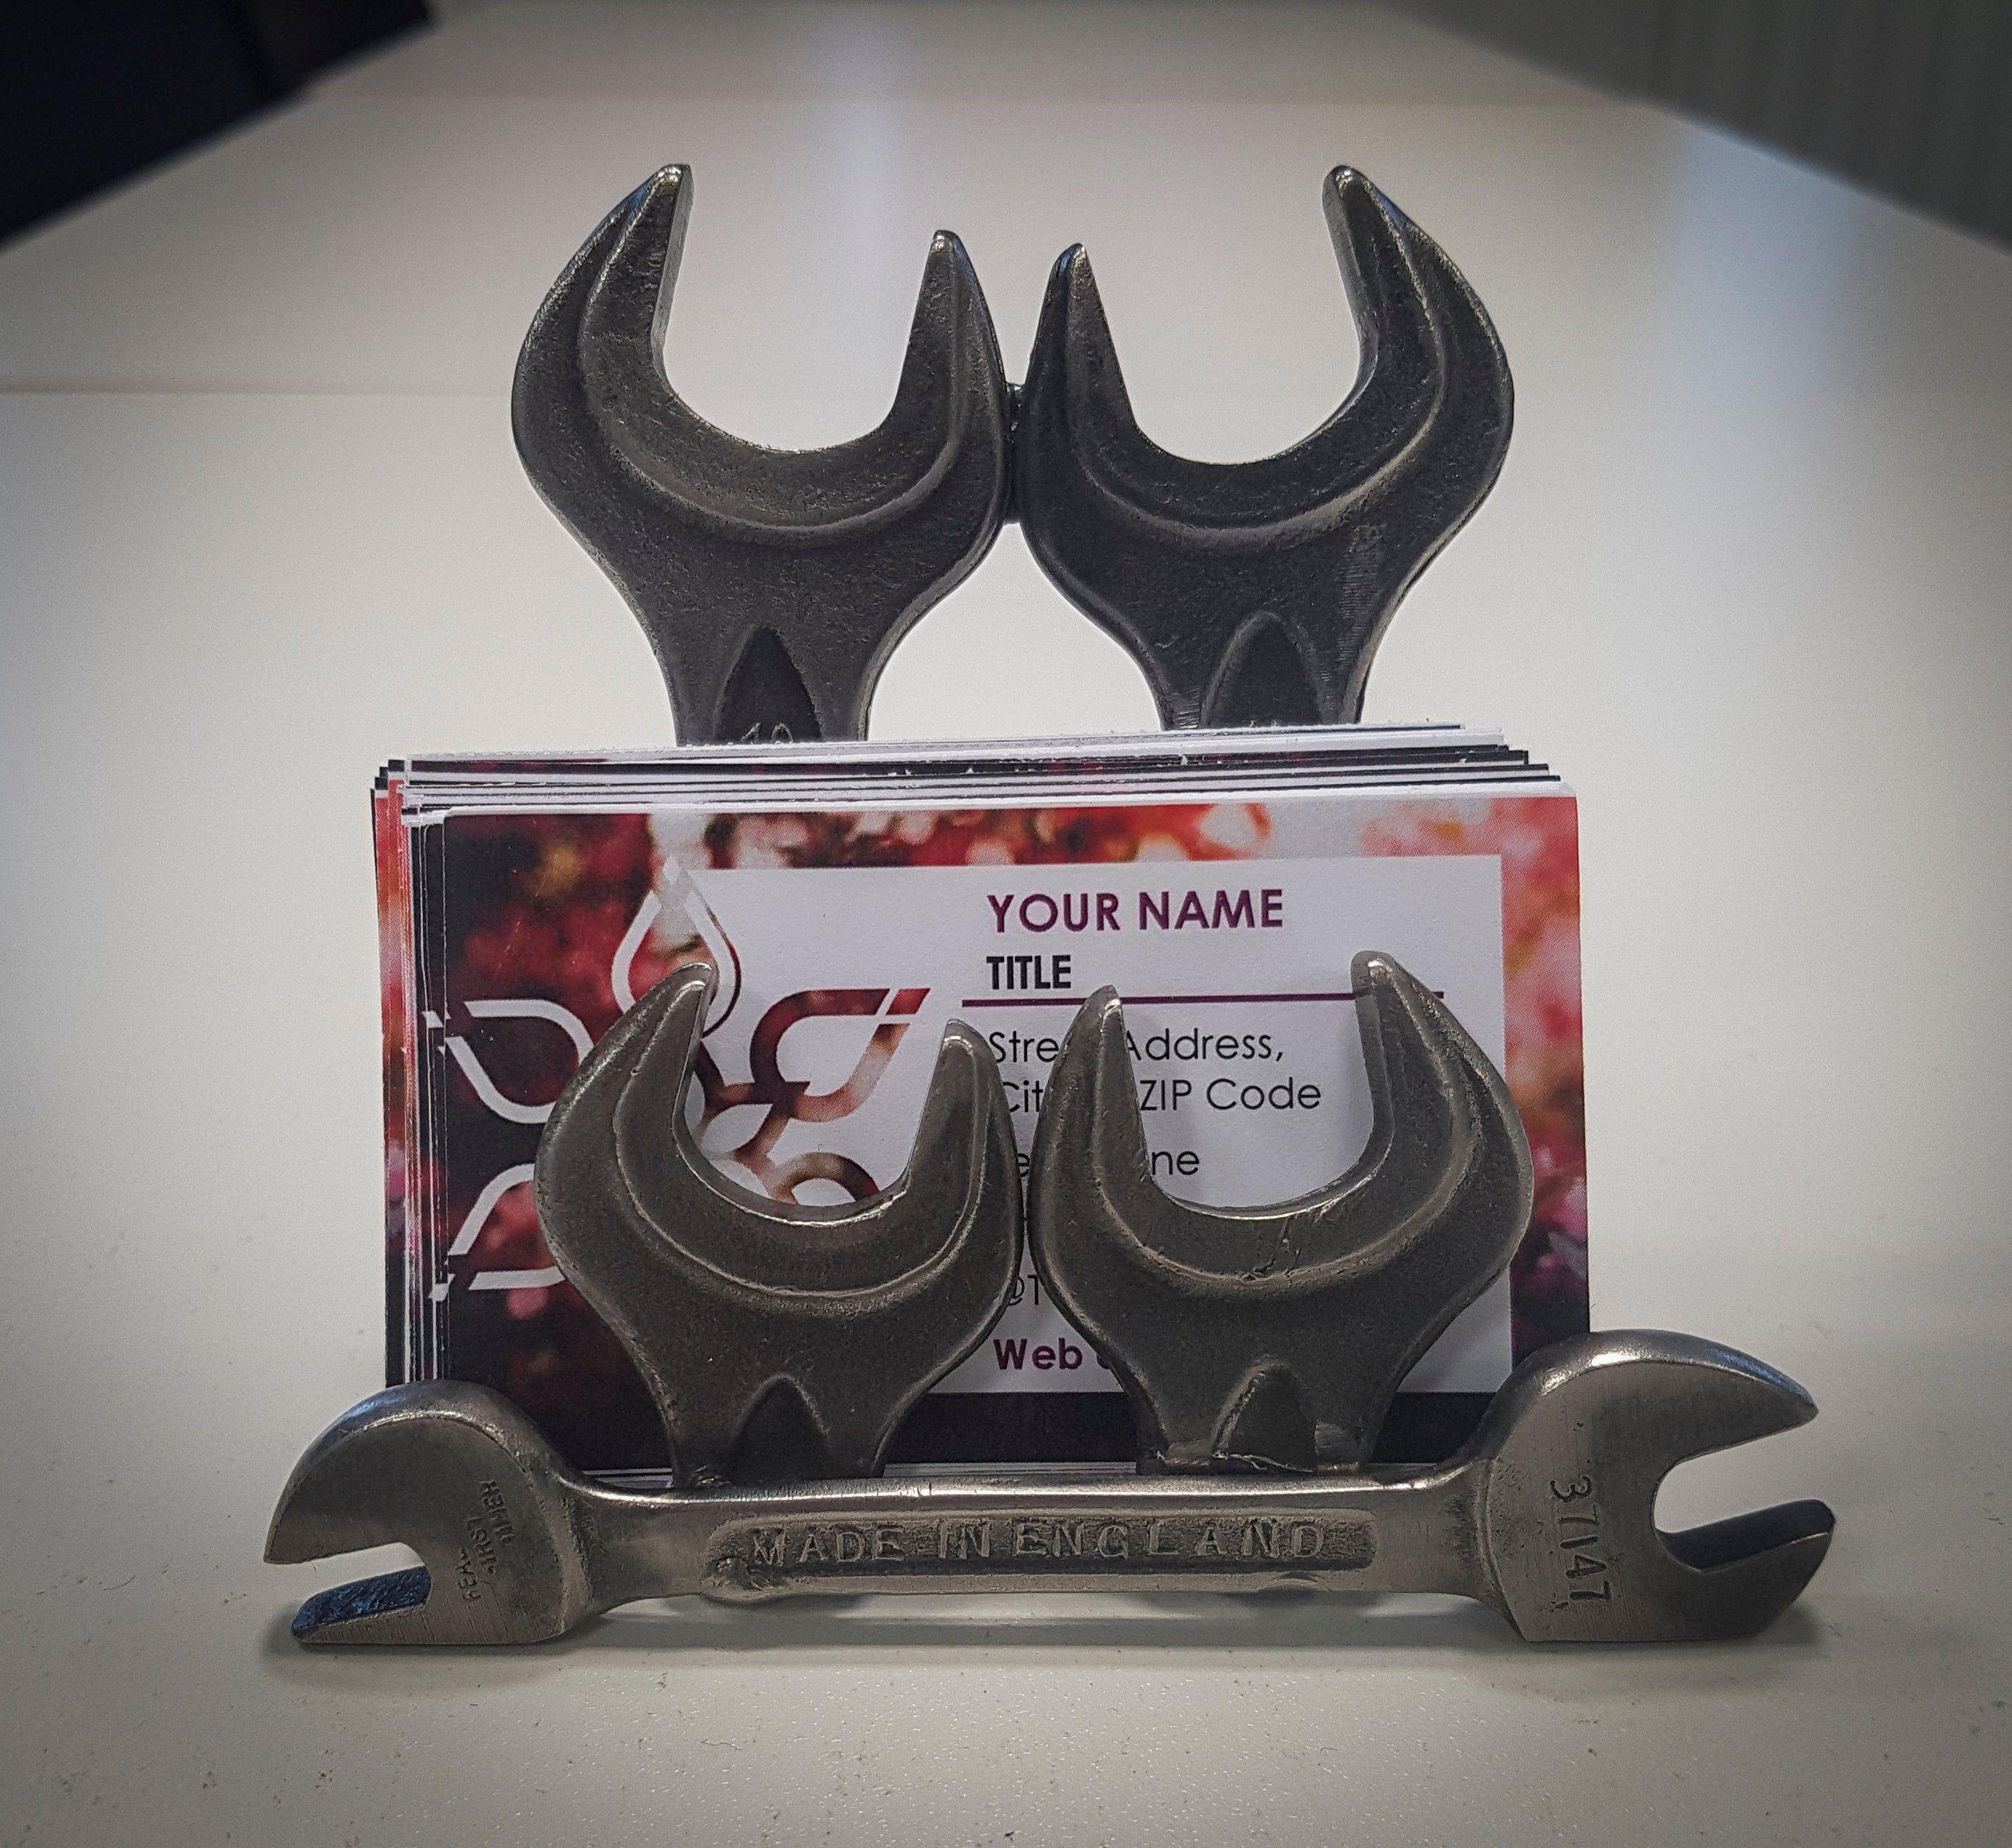 Scrap Metal Handmade Industrial Business Card Holder Made Etsy Welding Projects Scrap Metal Art Business Card Displays